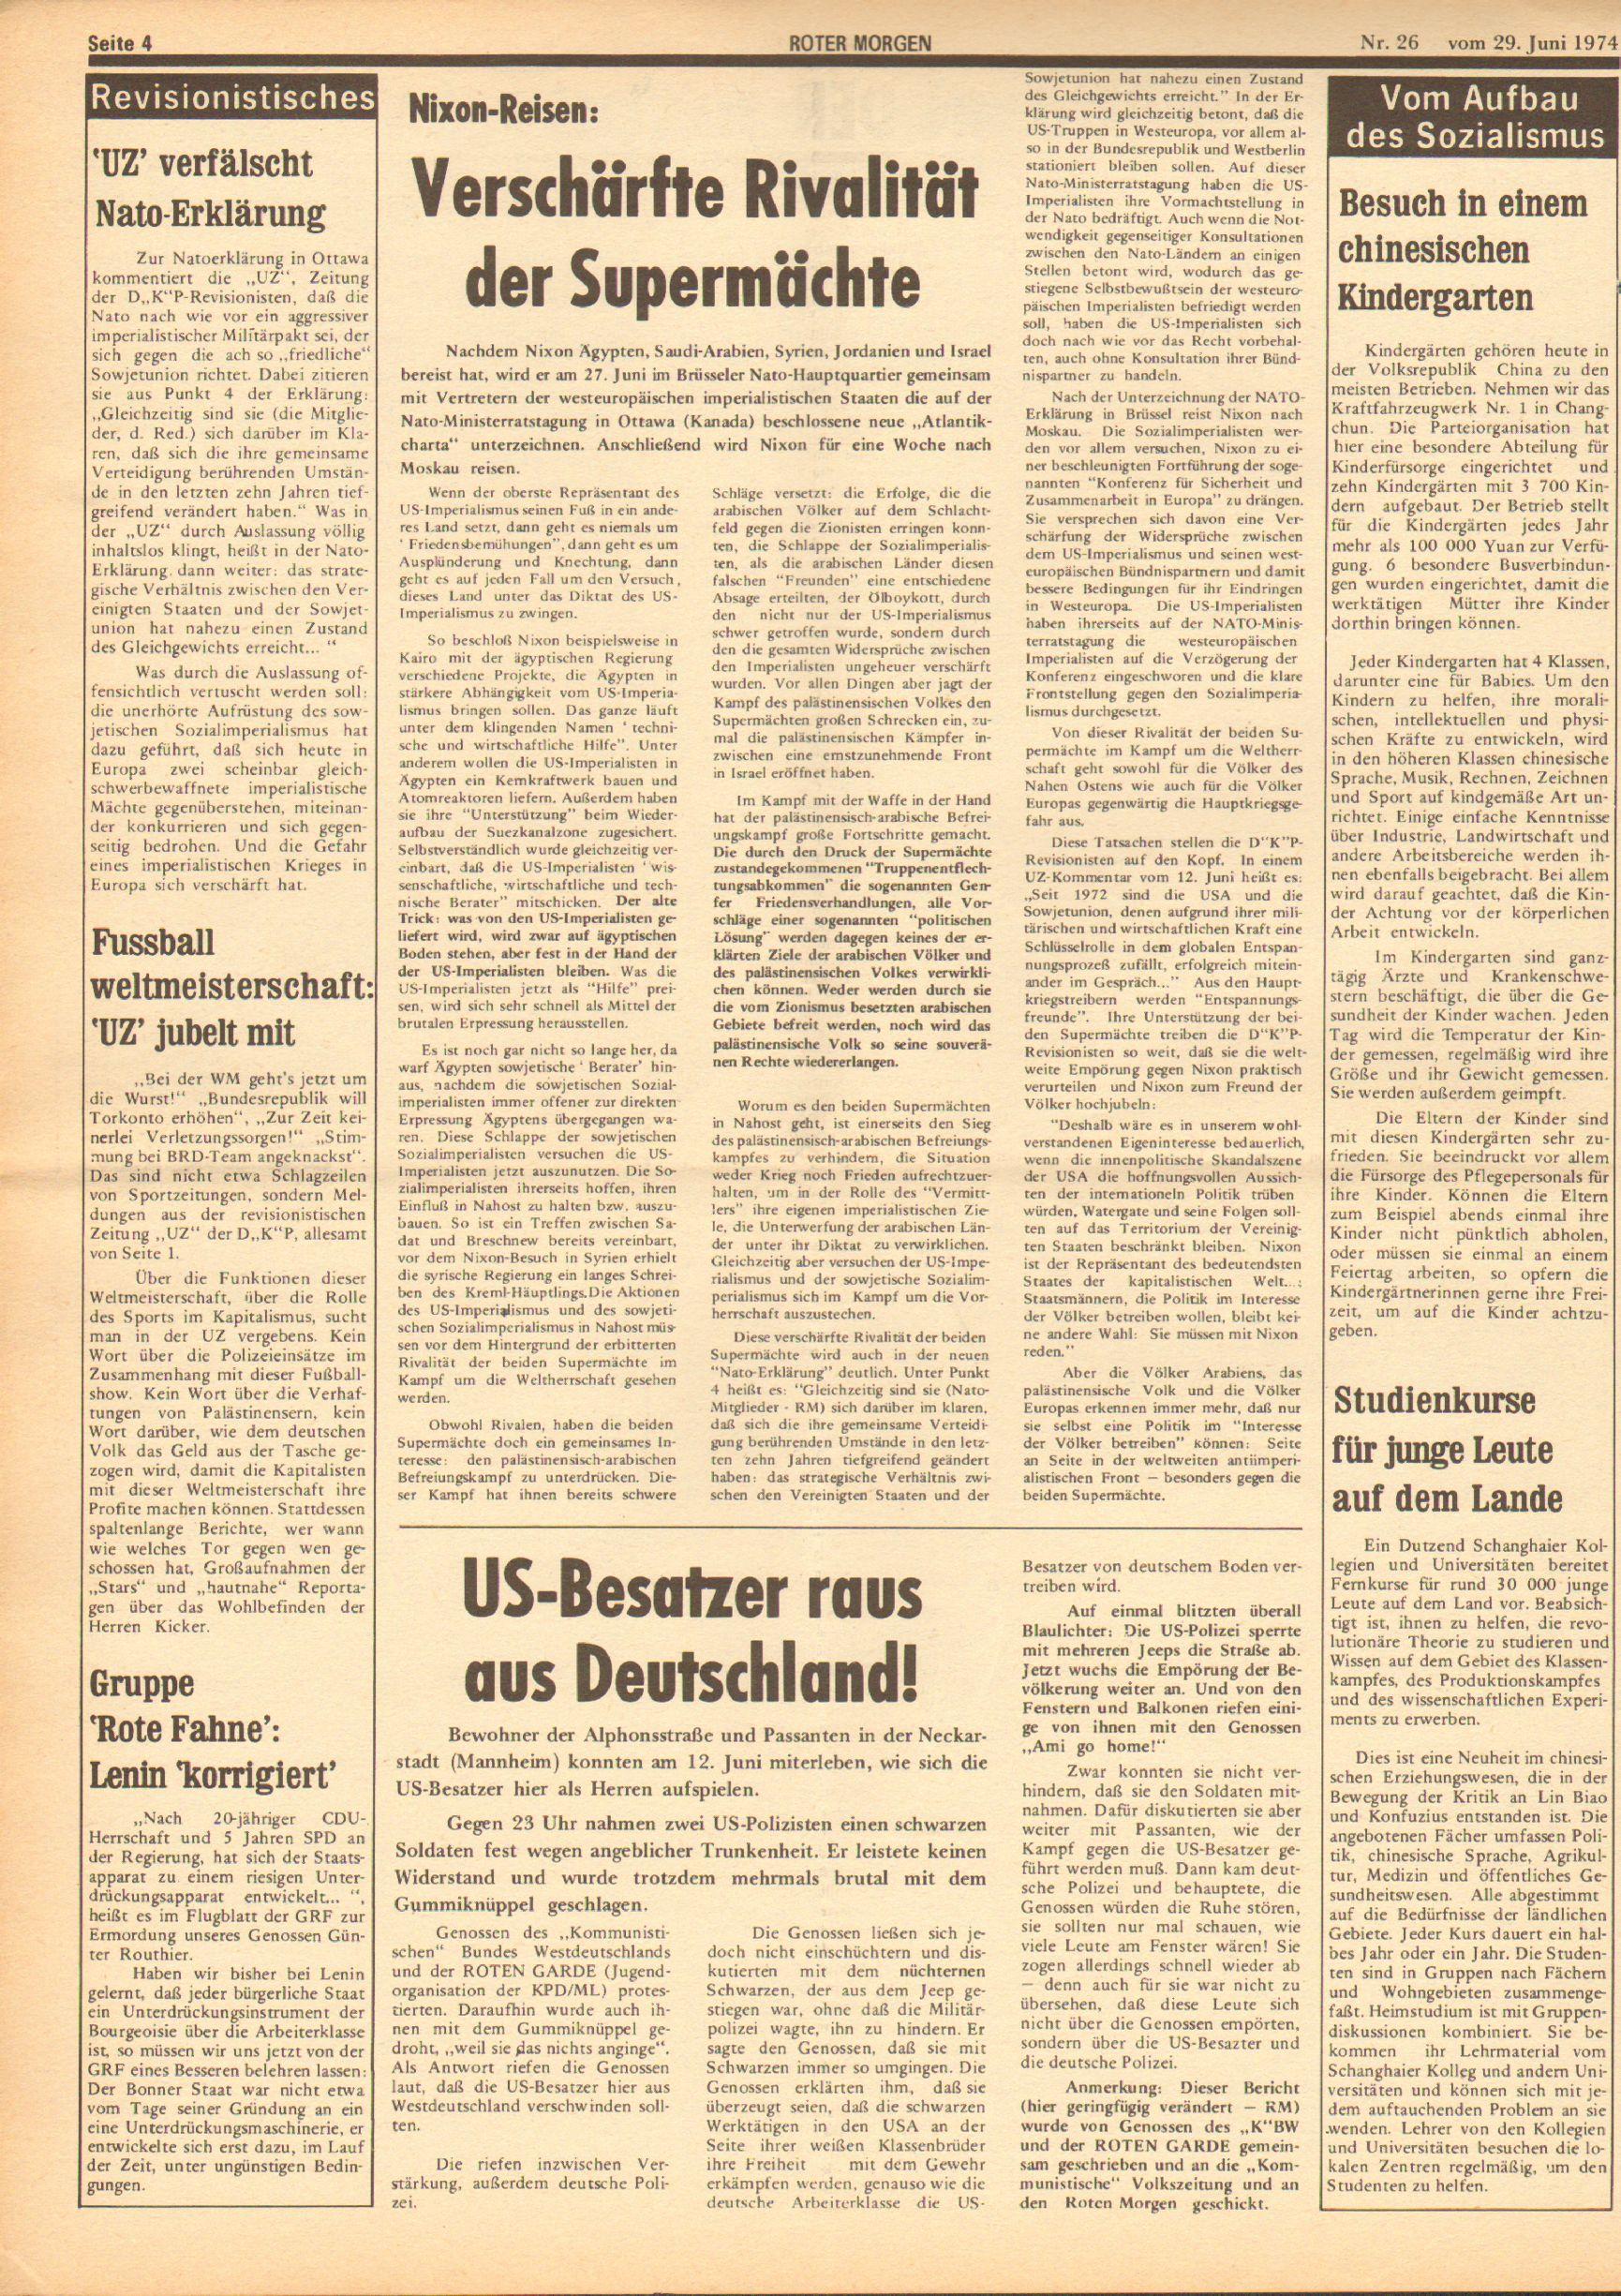 Roter Morgen, 8. Jg., 29. Juni 1974, Nr. 26, Seite 4